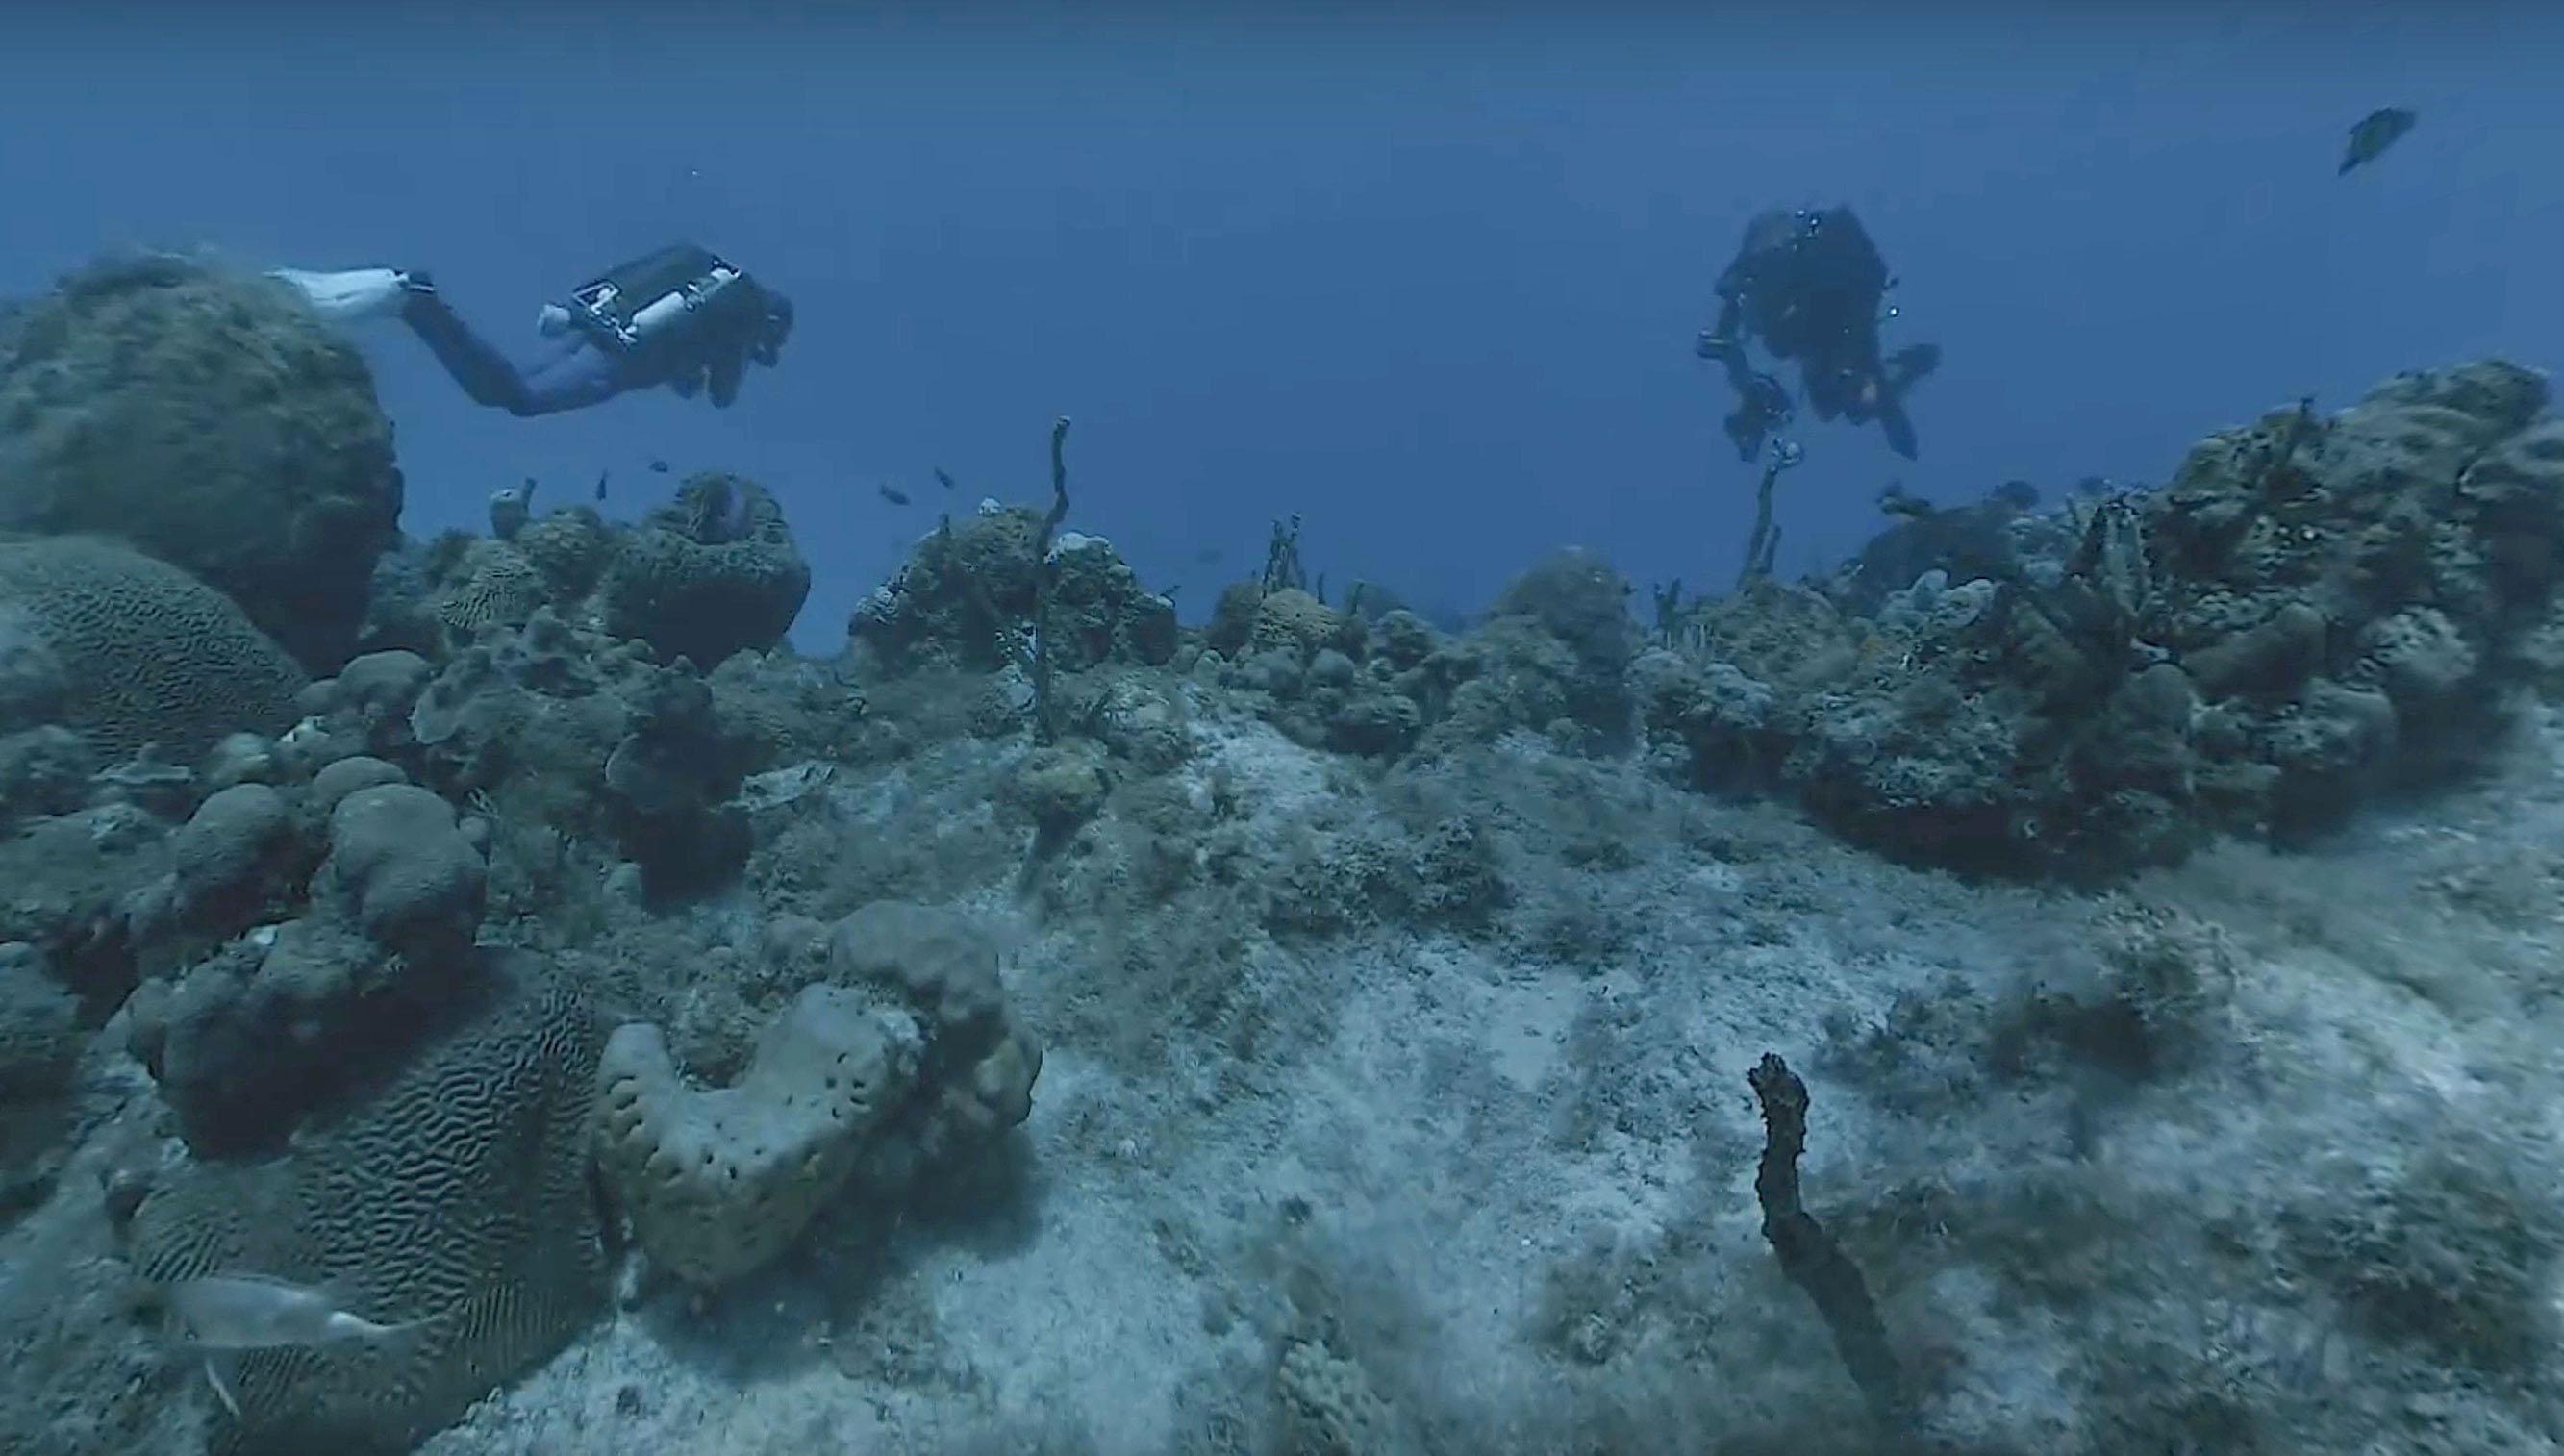 Hydrus VR records cinema-quality 8K virtual reality videos underwater